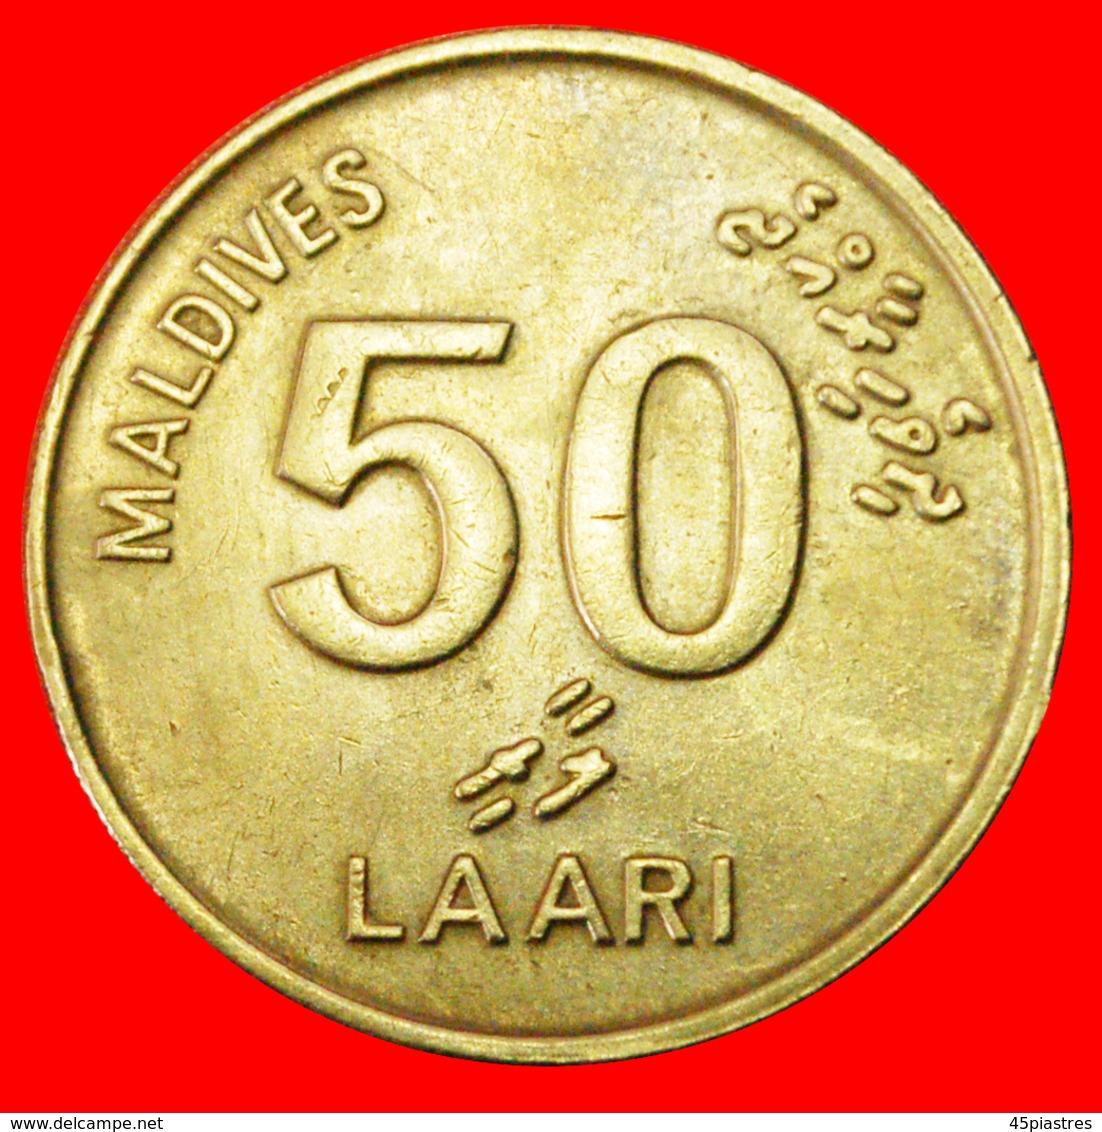 # SEA TURTLE: MALDIVES ★ 50 LAARI 1415 1995! LOW START ★ NO RESERVE! - Maldive